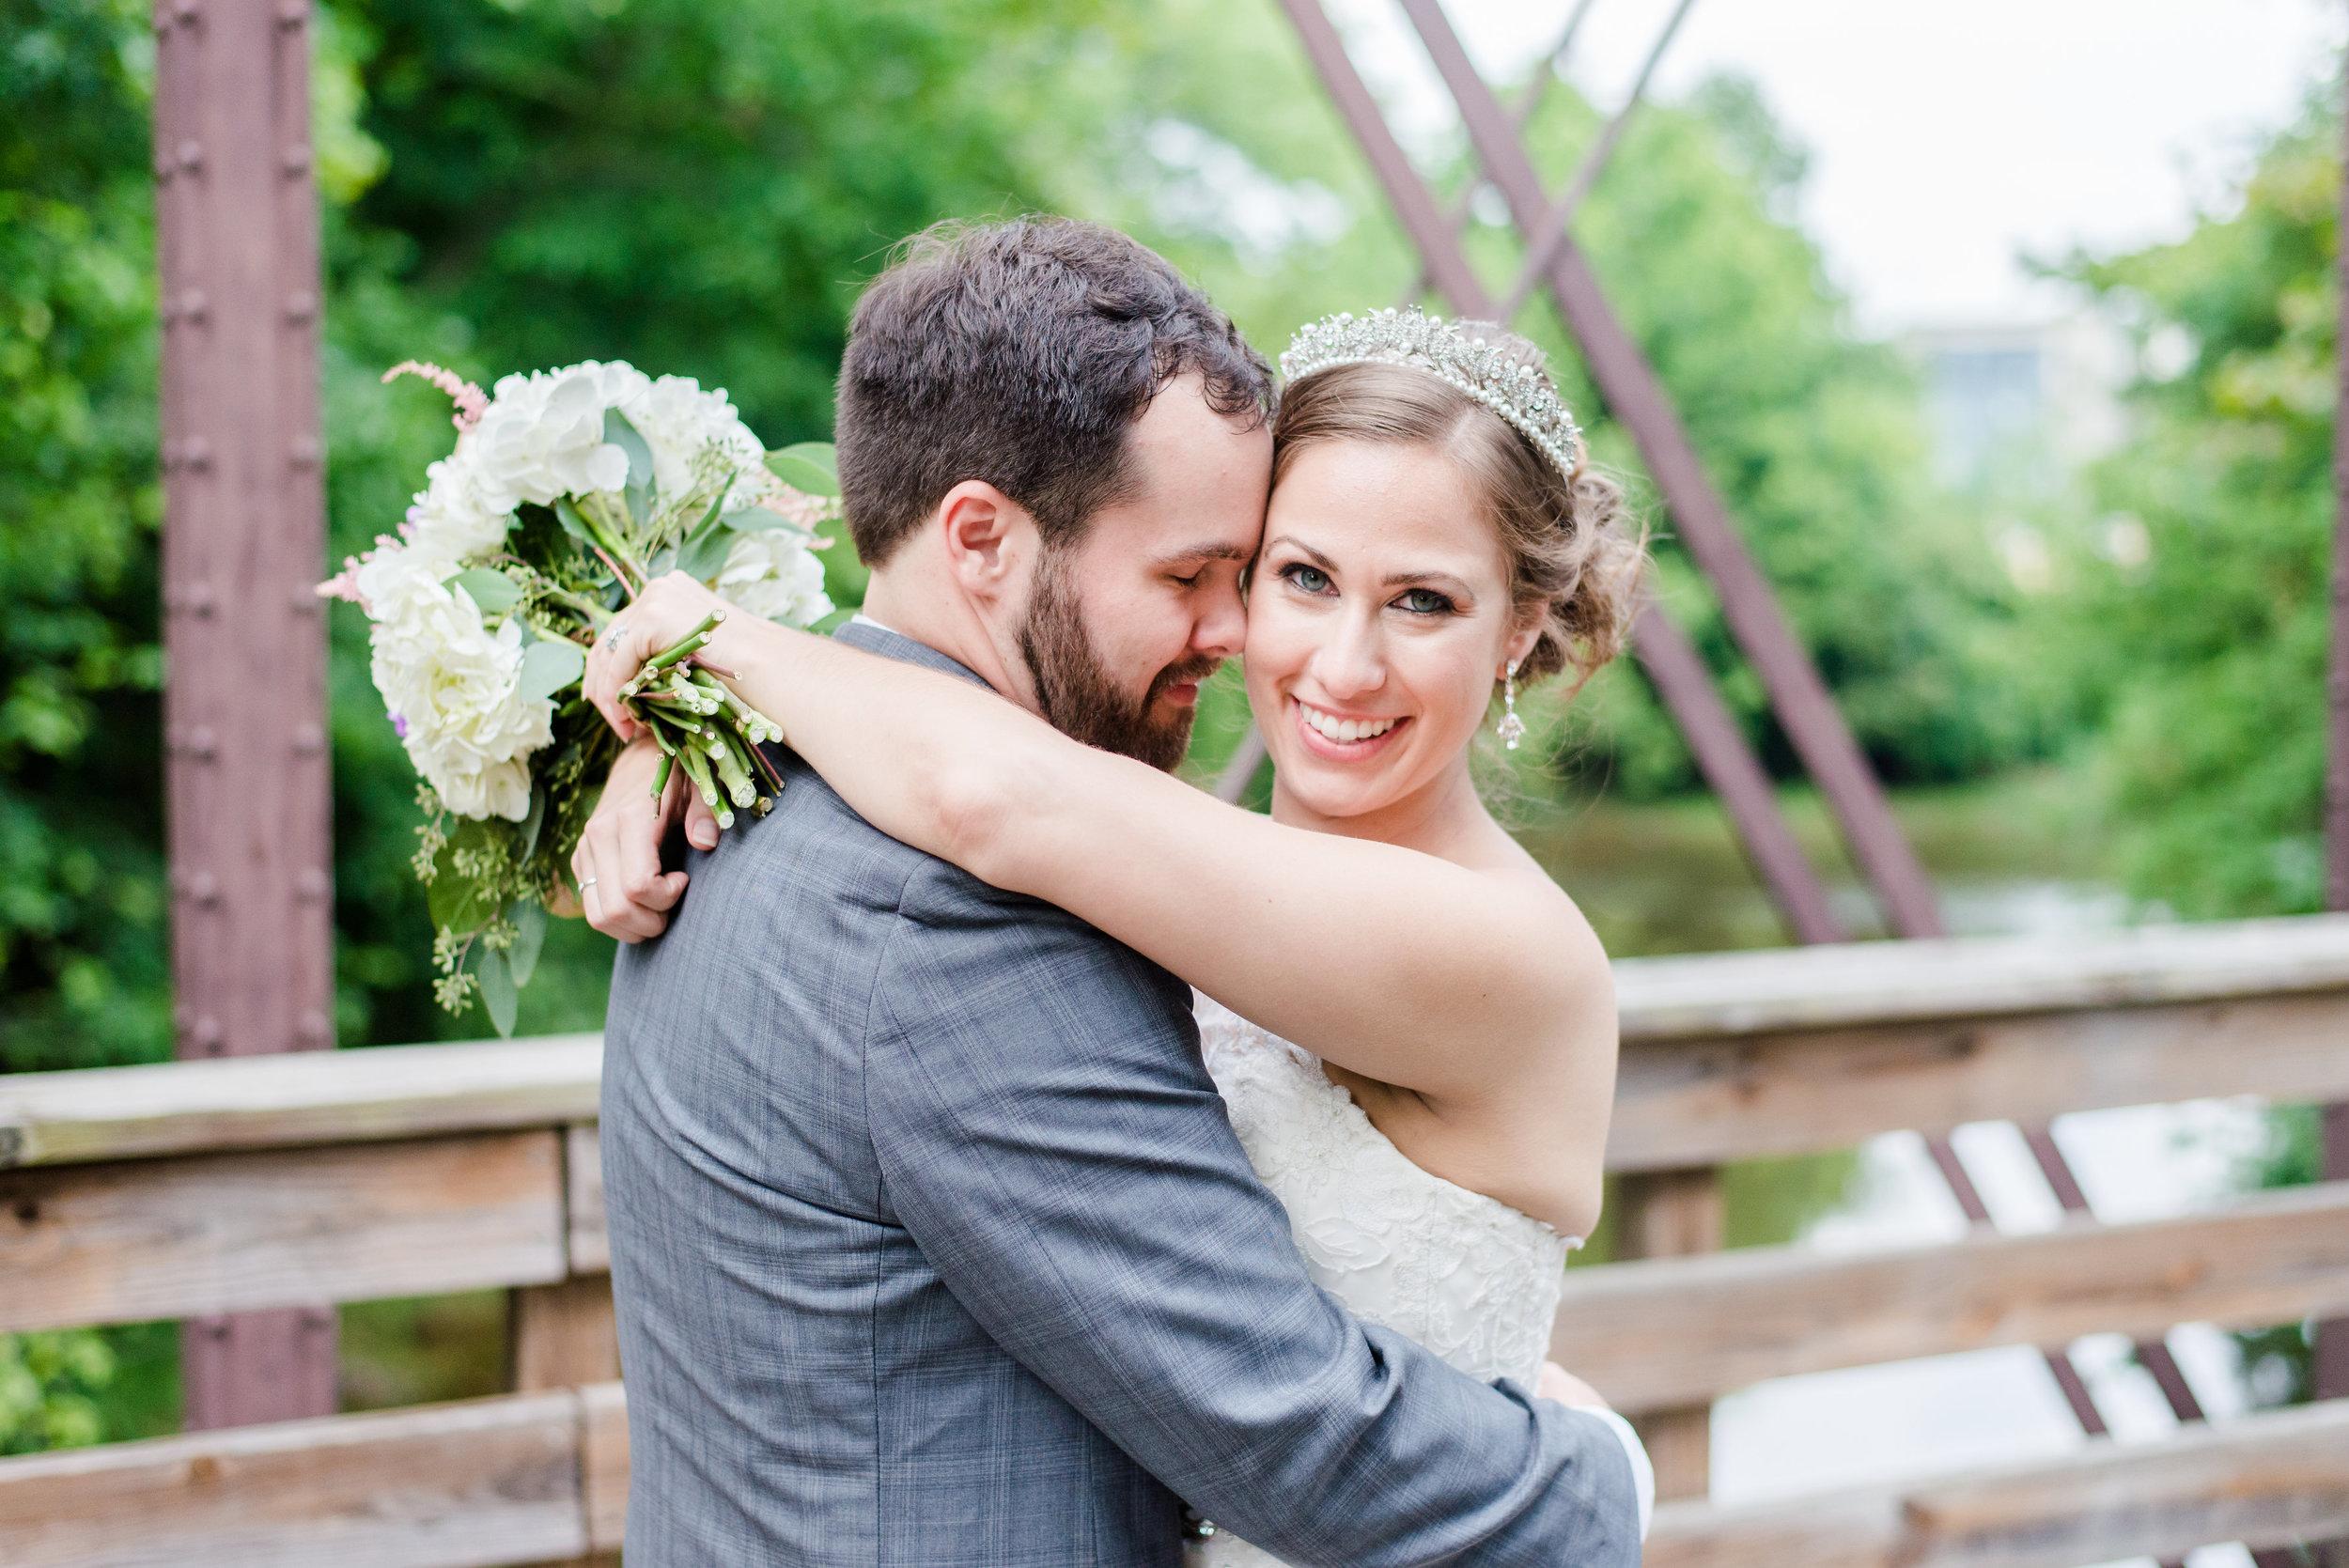 Wedding-Photographer-The-Foundry-Pheonixville-Pennsylvania-Andrea-Krout-Photography-249.jpg